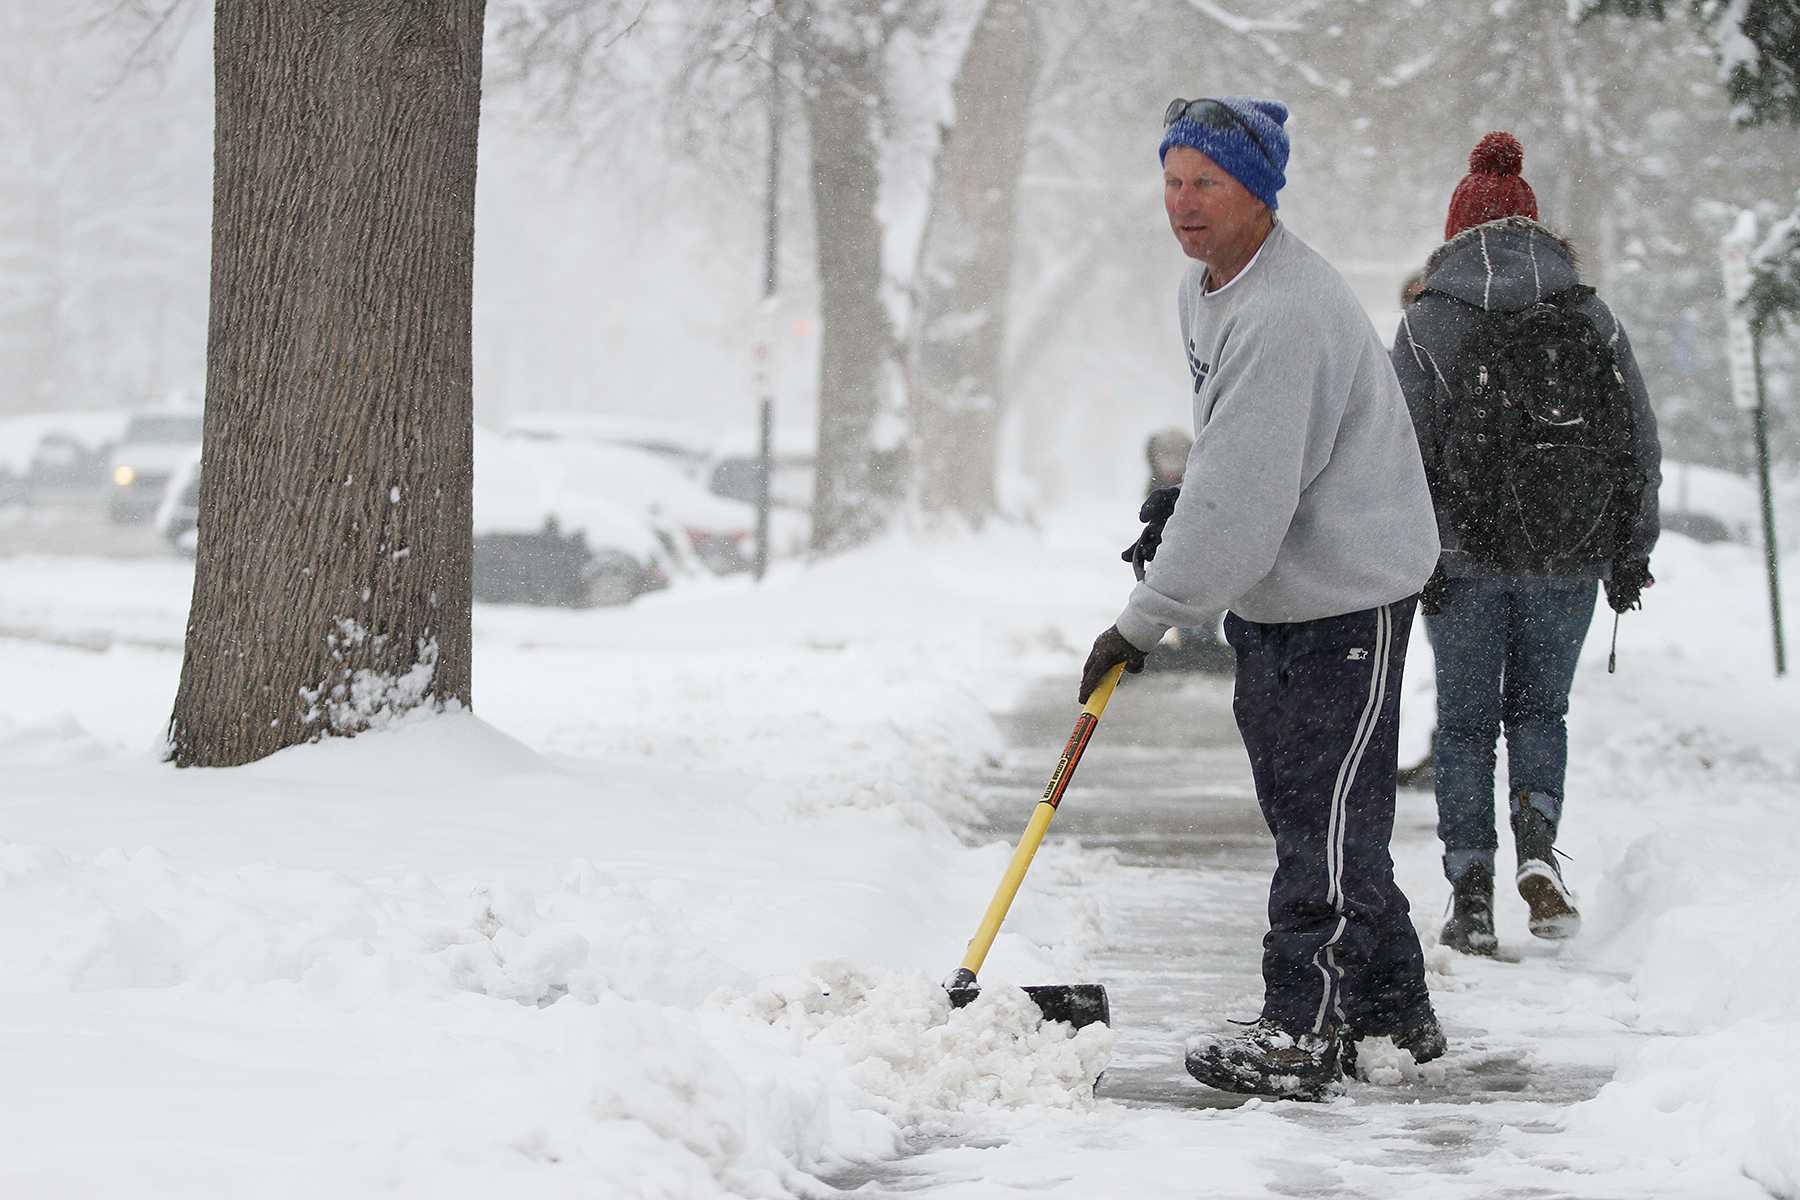 Dave Dean shovels snows off his sidewalk on Meldrum on Monday afternoon.